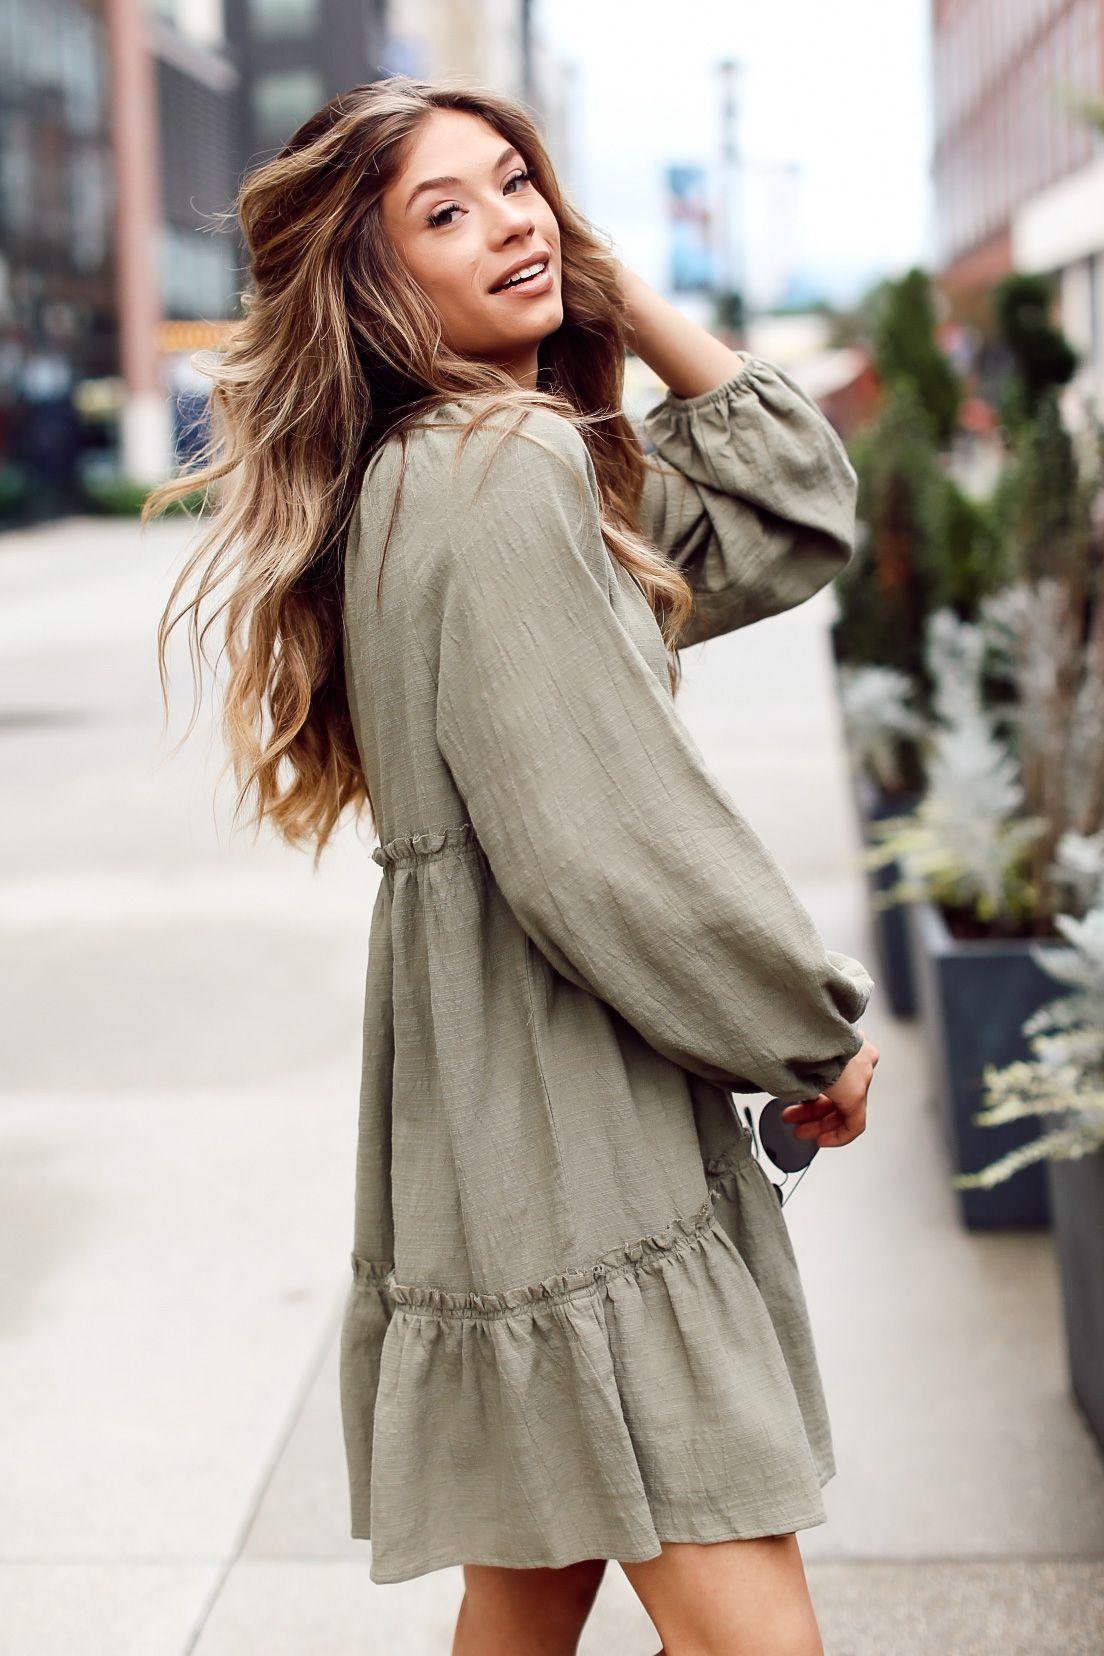 Julie Tiered Babydoll Dress Cute Long Sleeve Dresses Fall Dress Outfit Casual Dress Outfits [ 1656 x 1104 Pixel ]